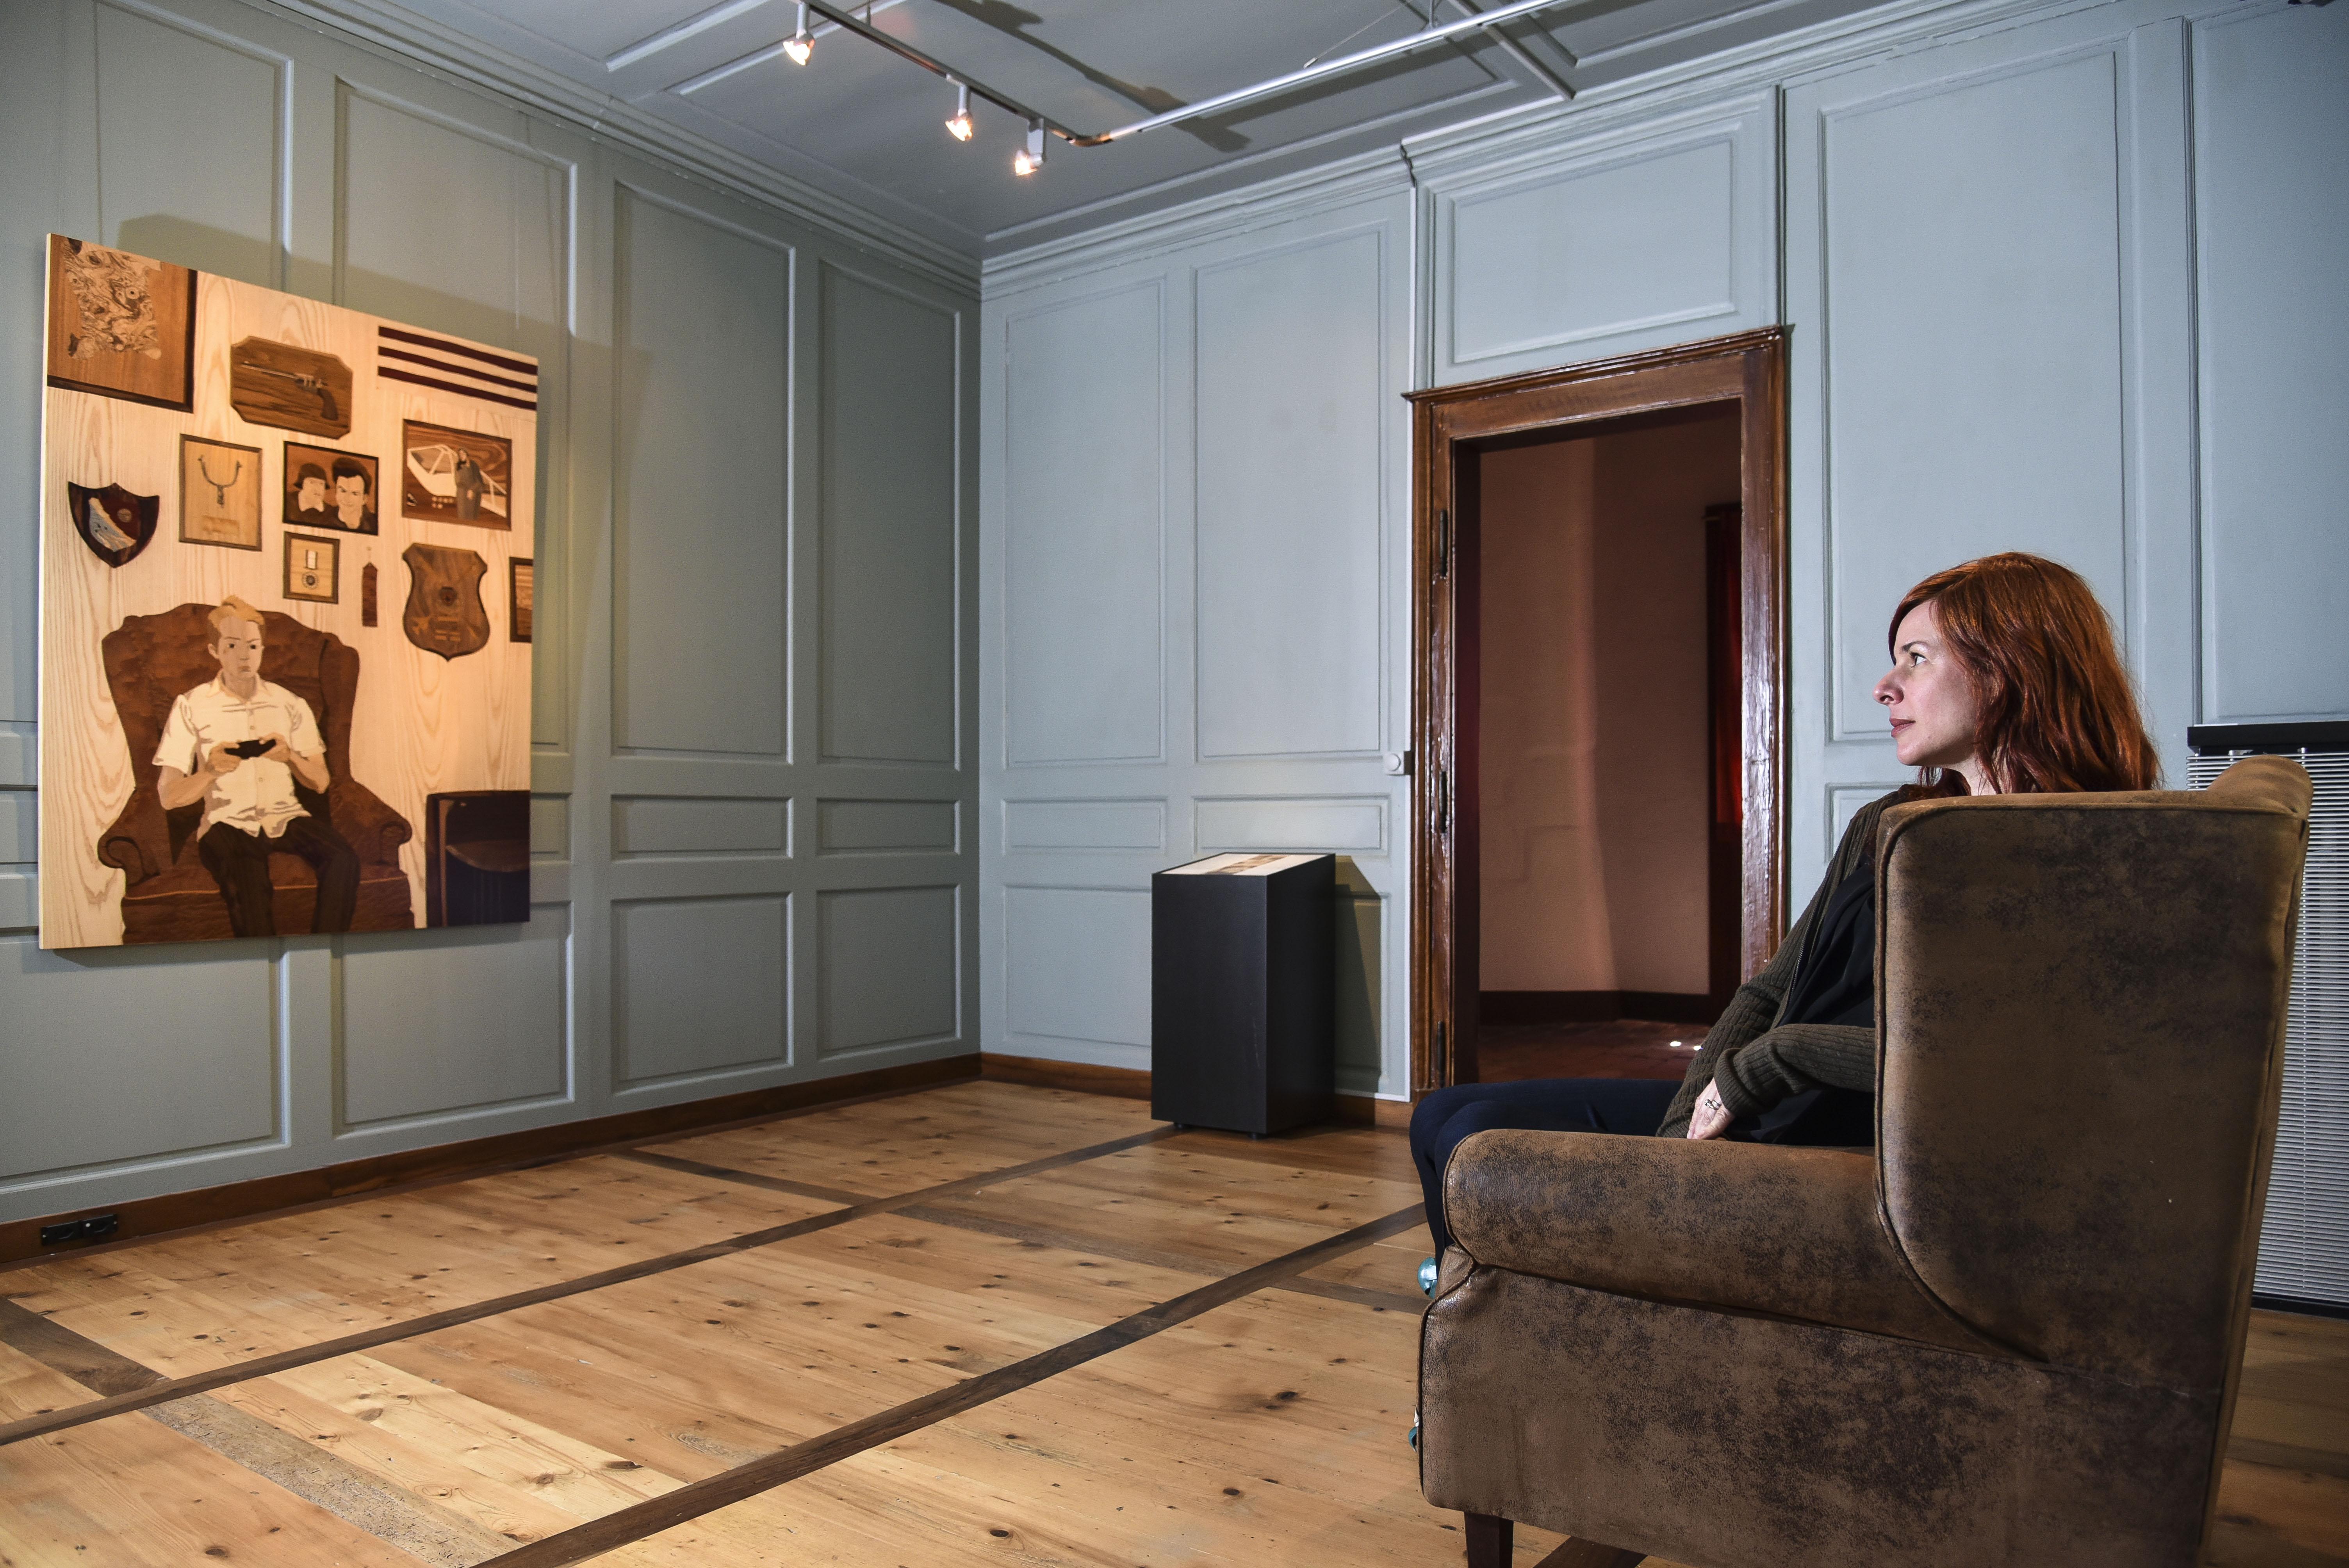 Alison Elizabeth Taylor, artiste